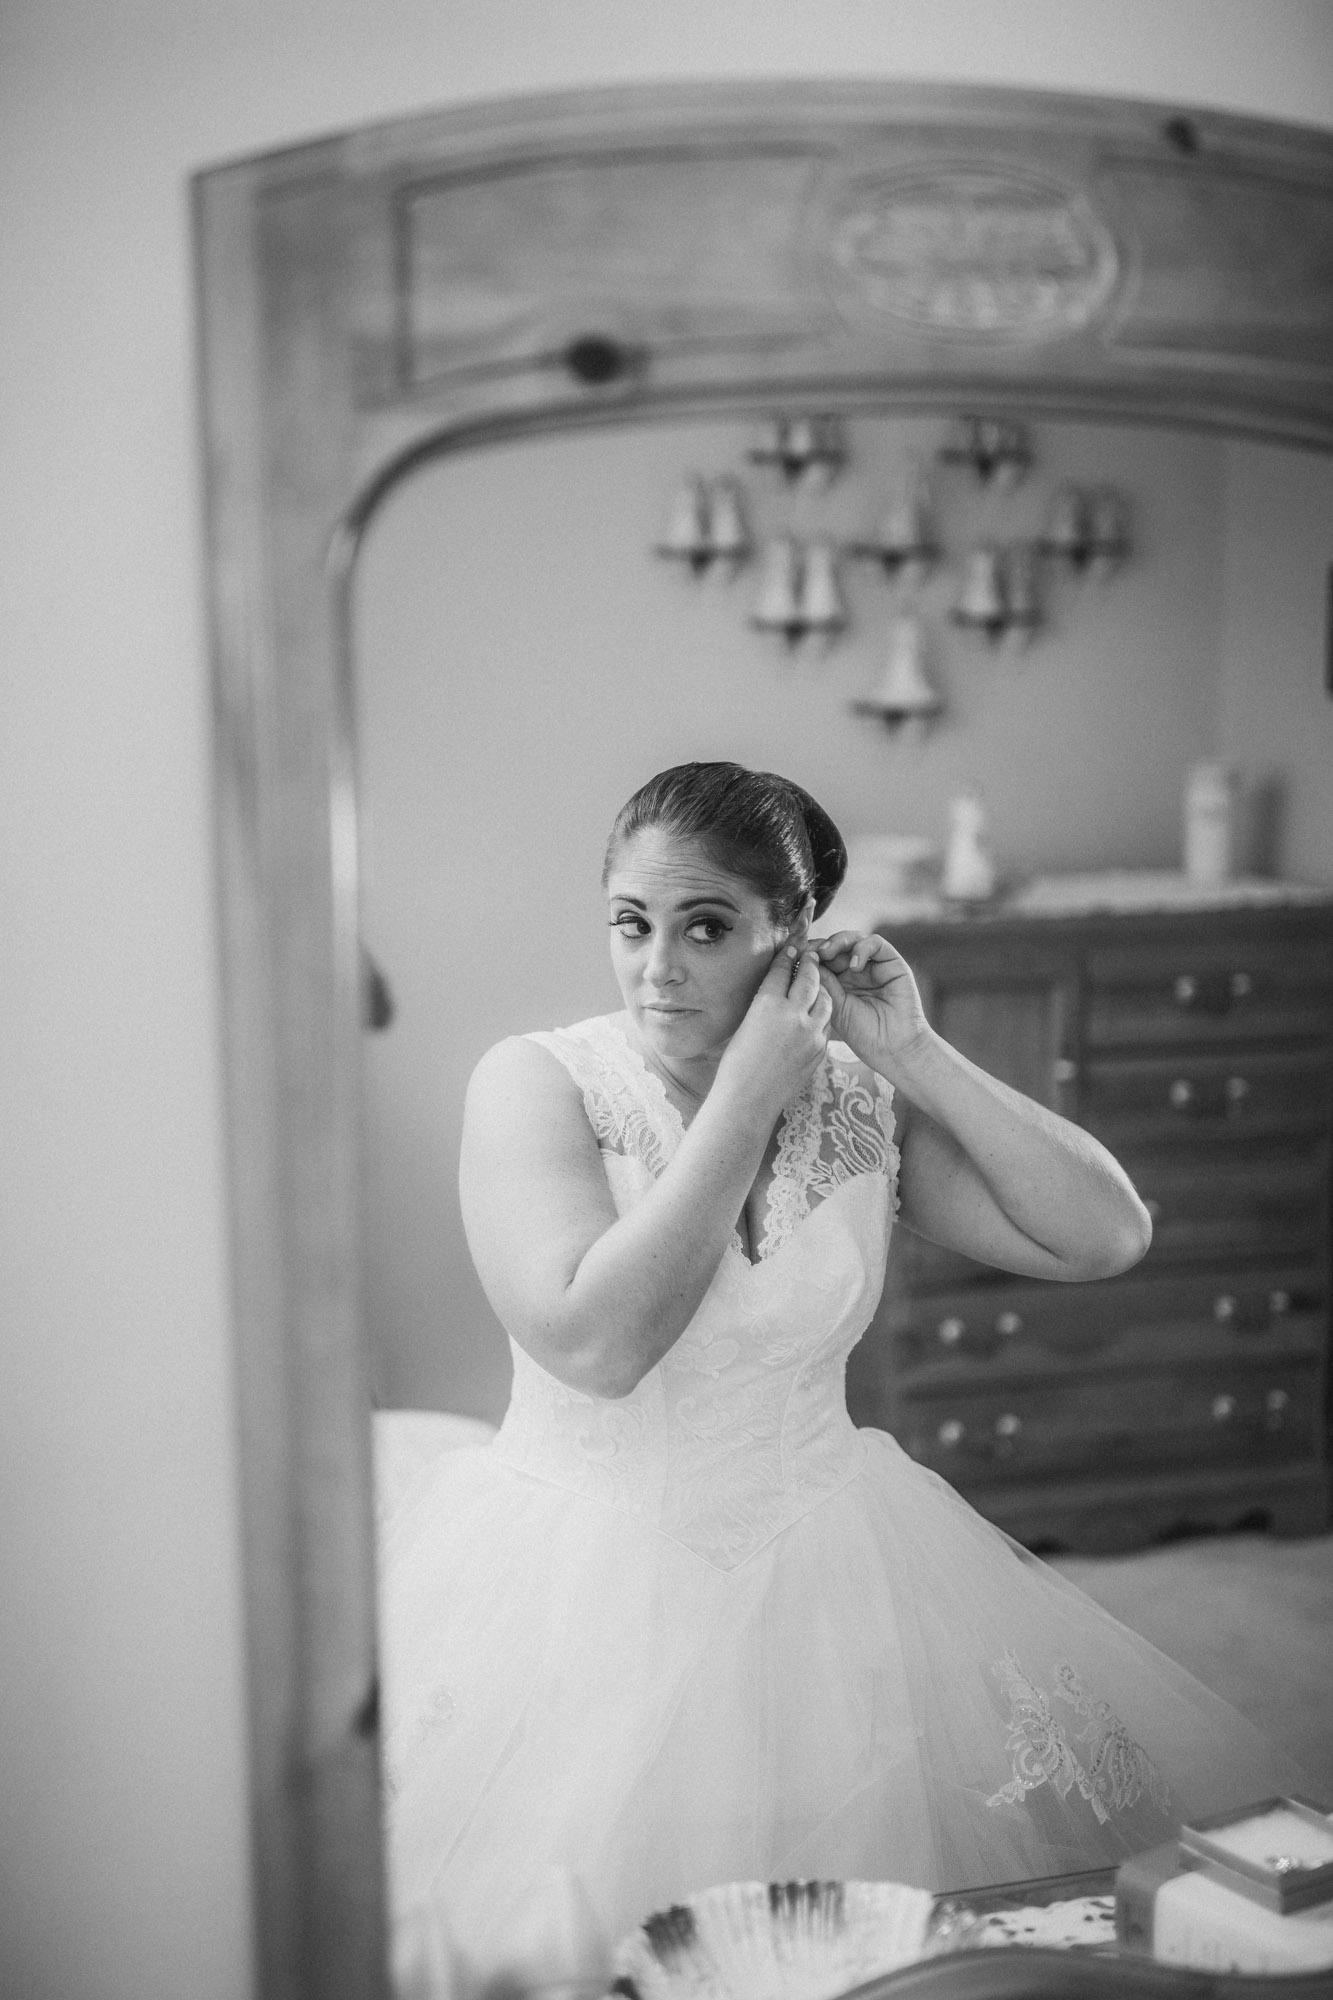 Mike & Danielle's Scranton Wedding Photography 14